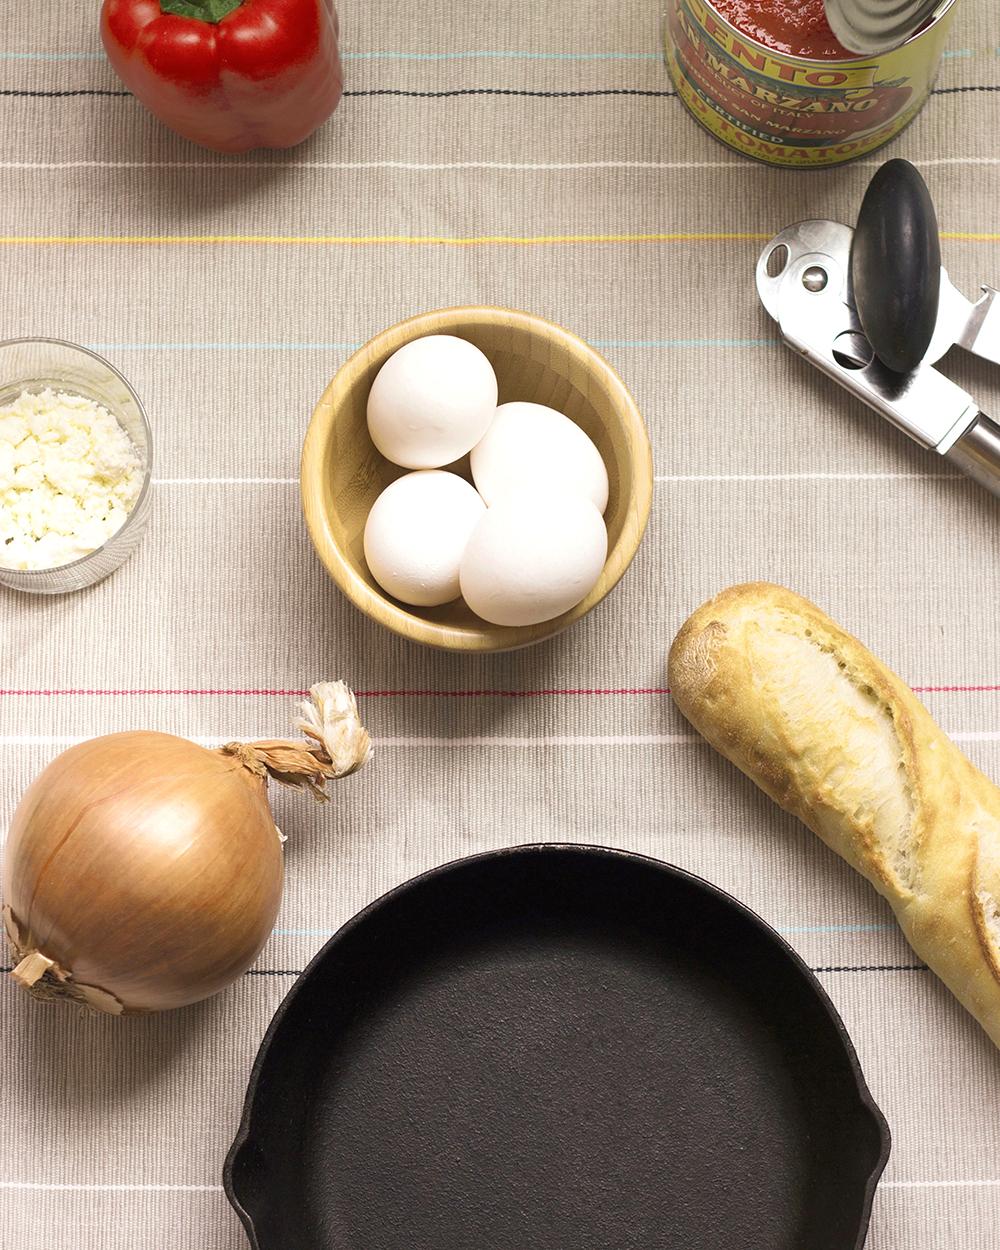 livvyland-blog-olivia-watson-austin-texas-lifestyle-blogger-healthy-shakshuka-recipe-vegetarian-3